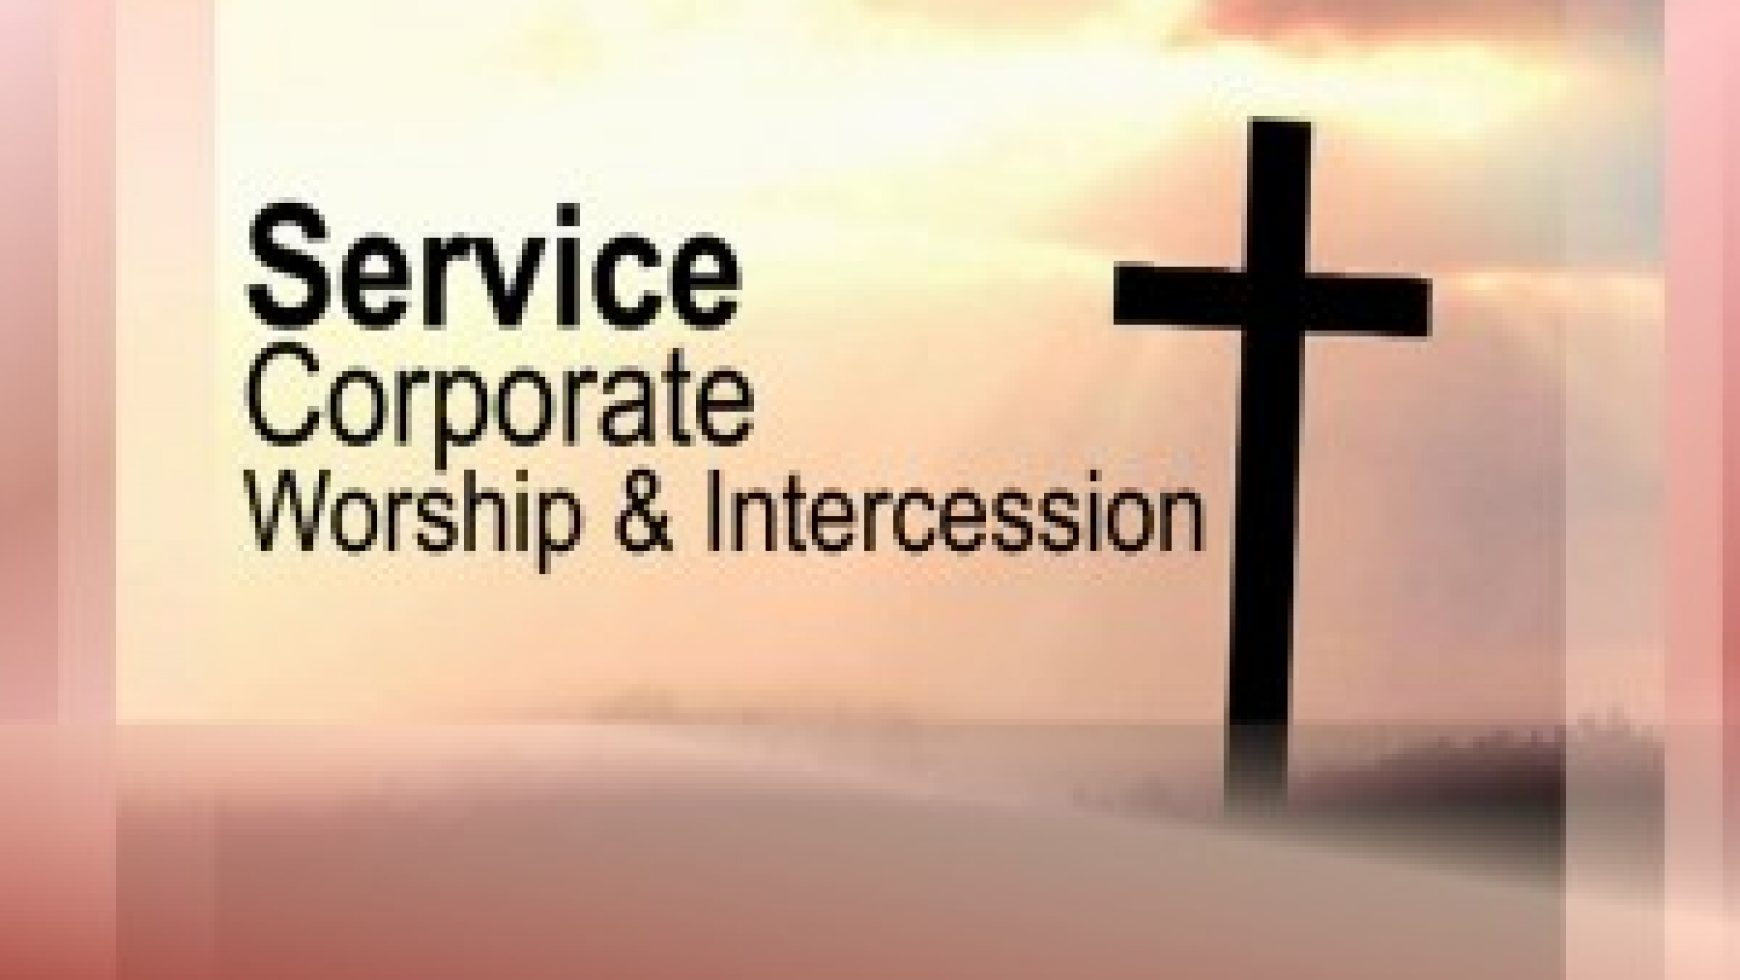 Service Corporate Worship & Intercession